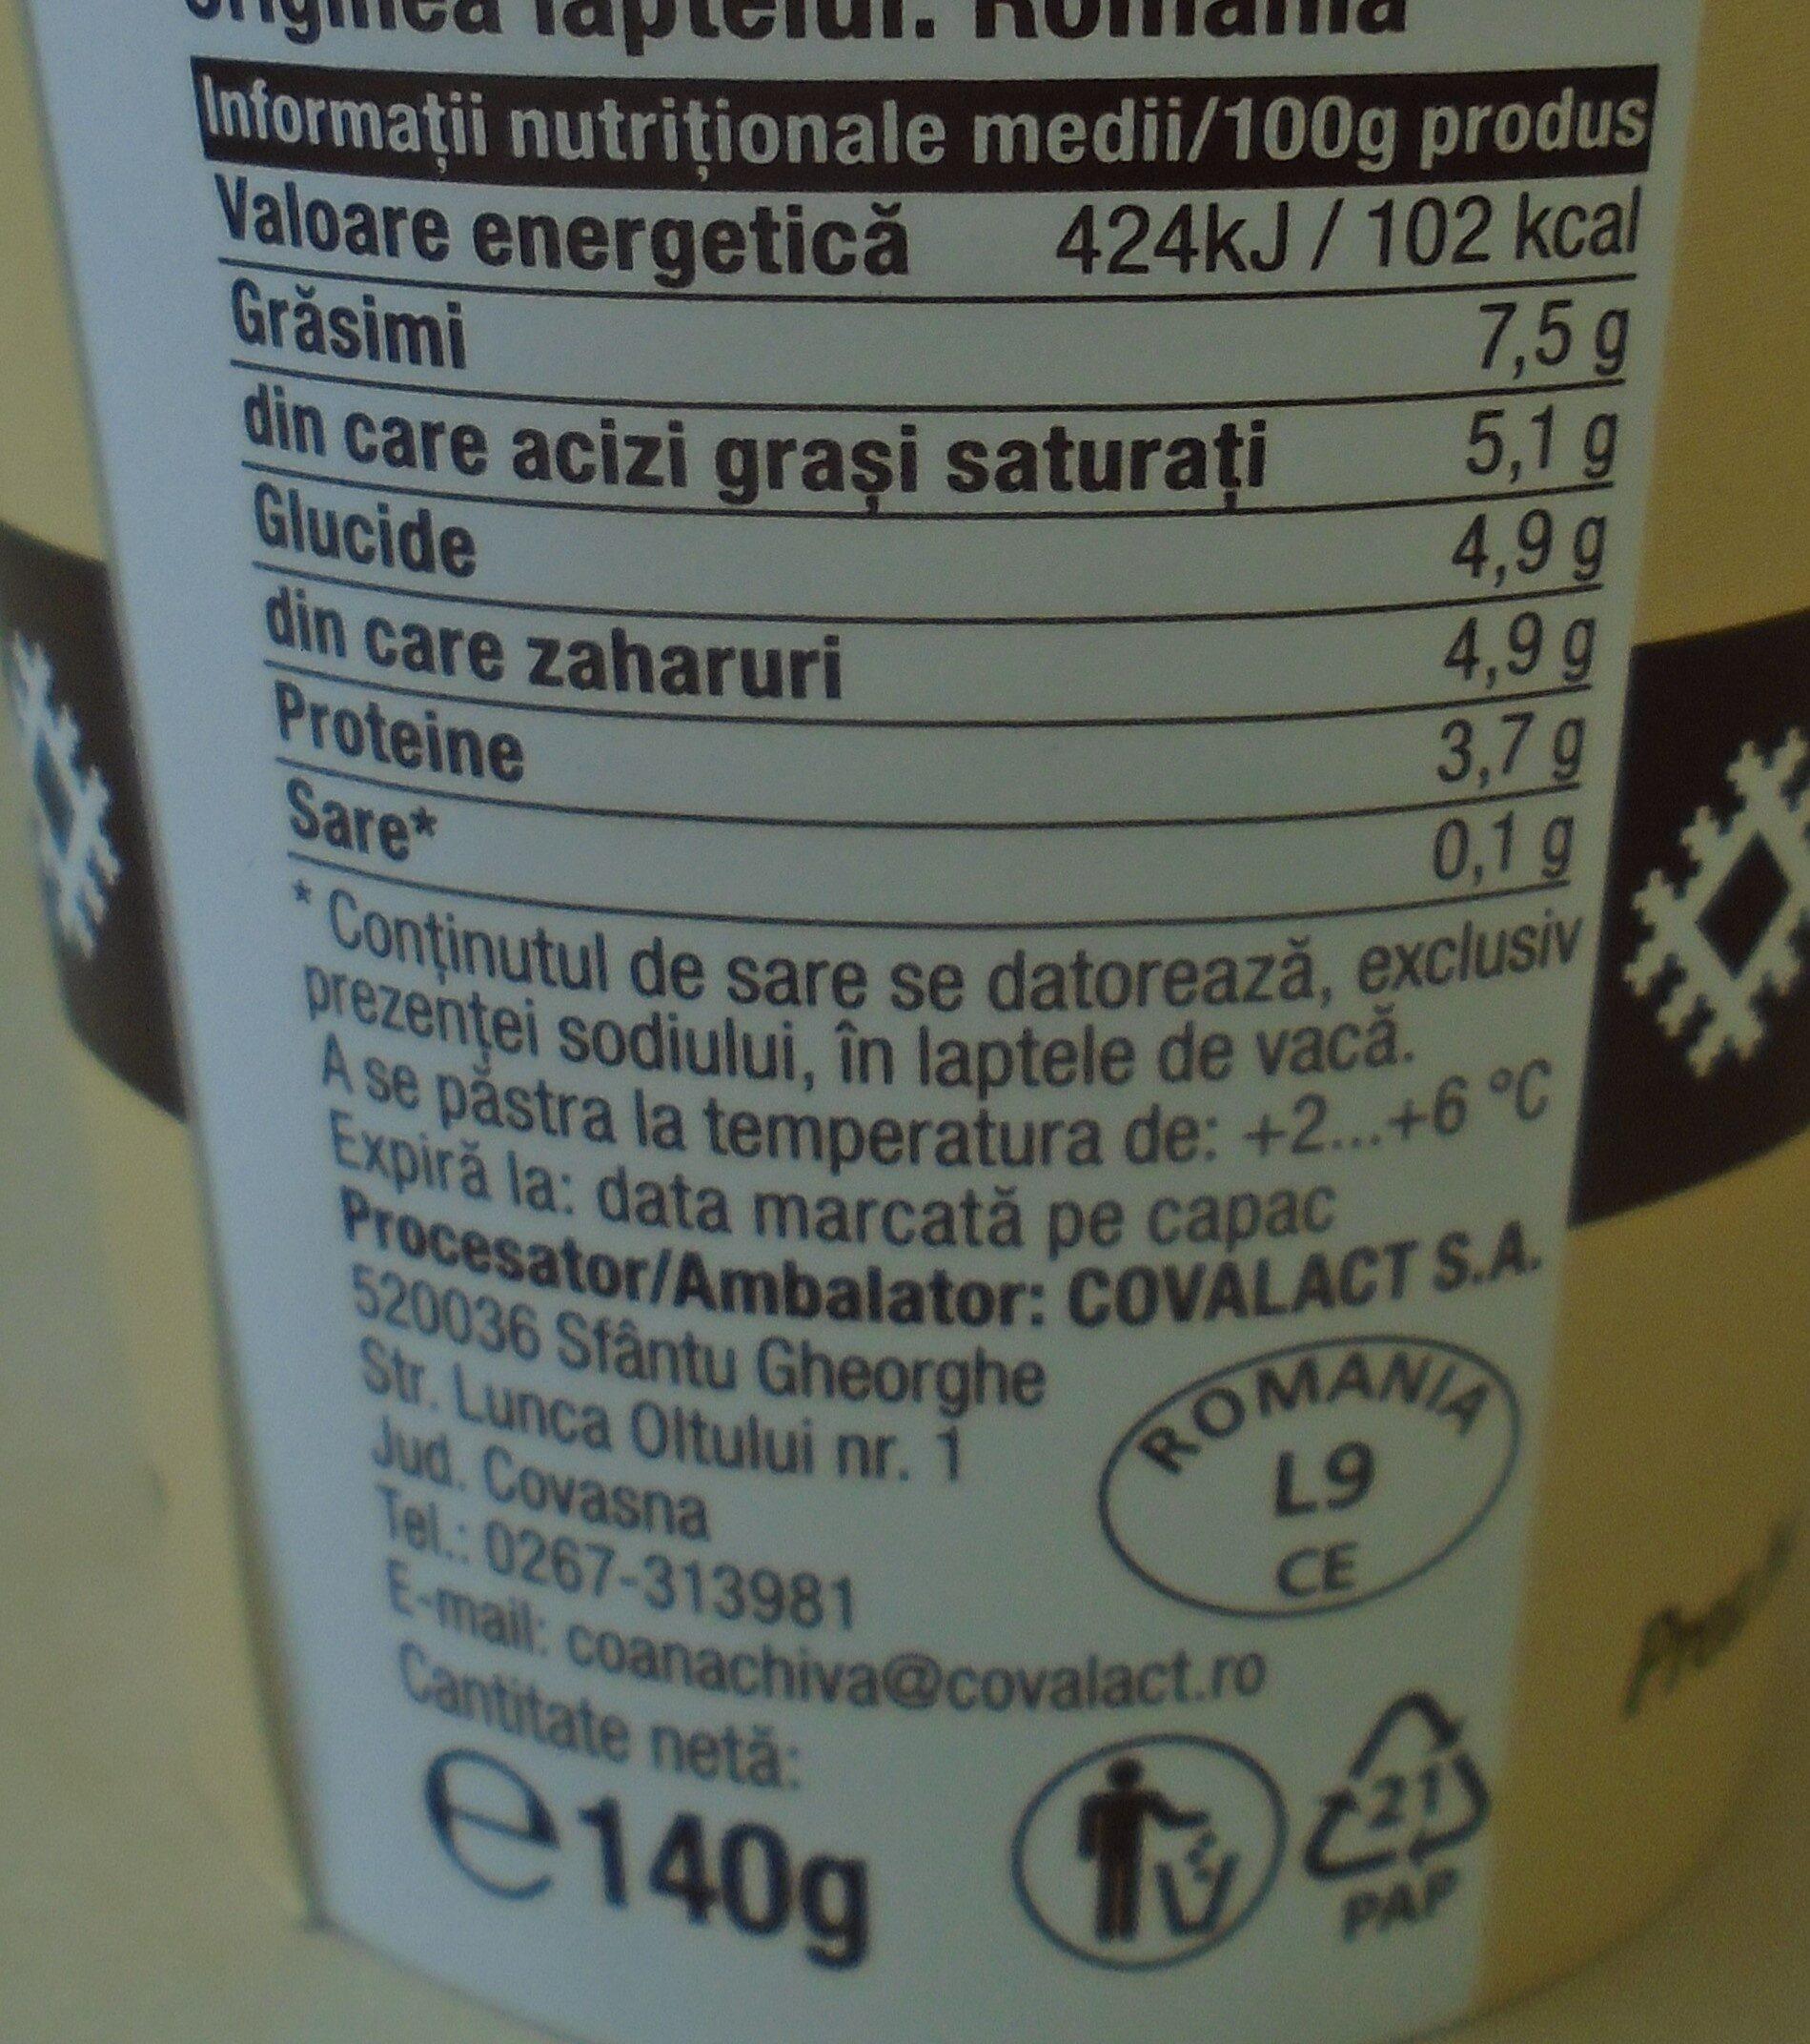 Covalact Iaurt cu caimac - Nutrition facts - ro